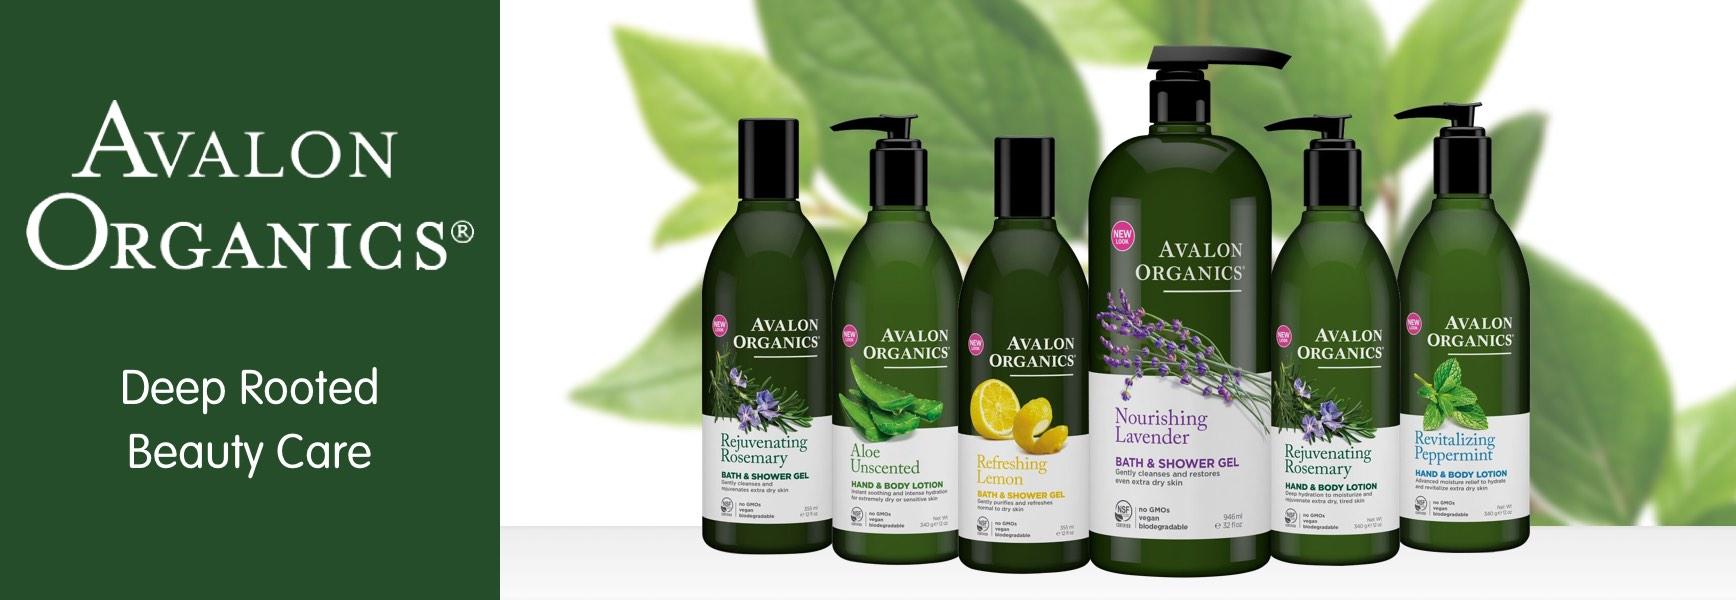 Avalon Organics Natural Hair And Skin Care